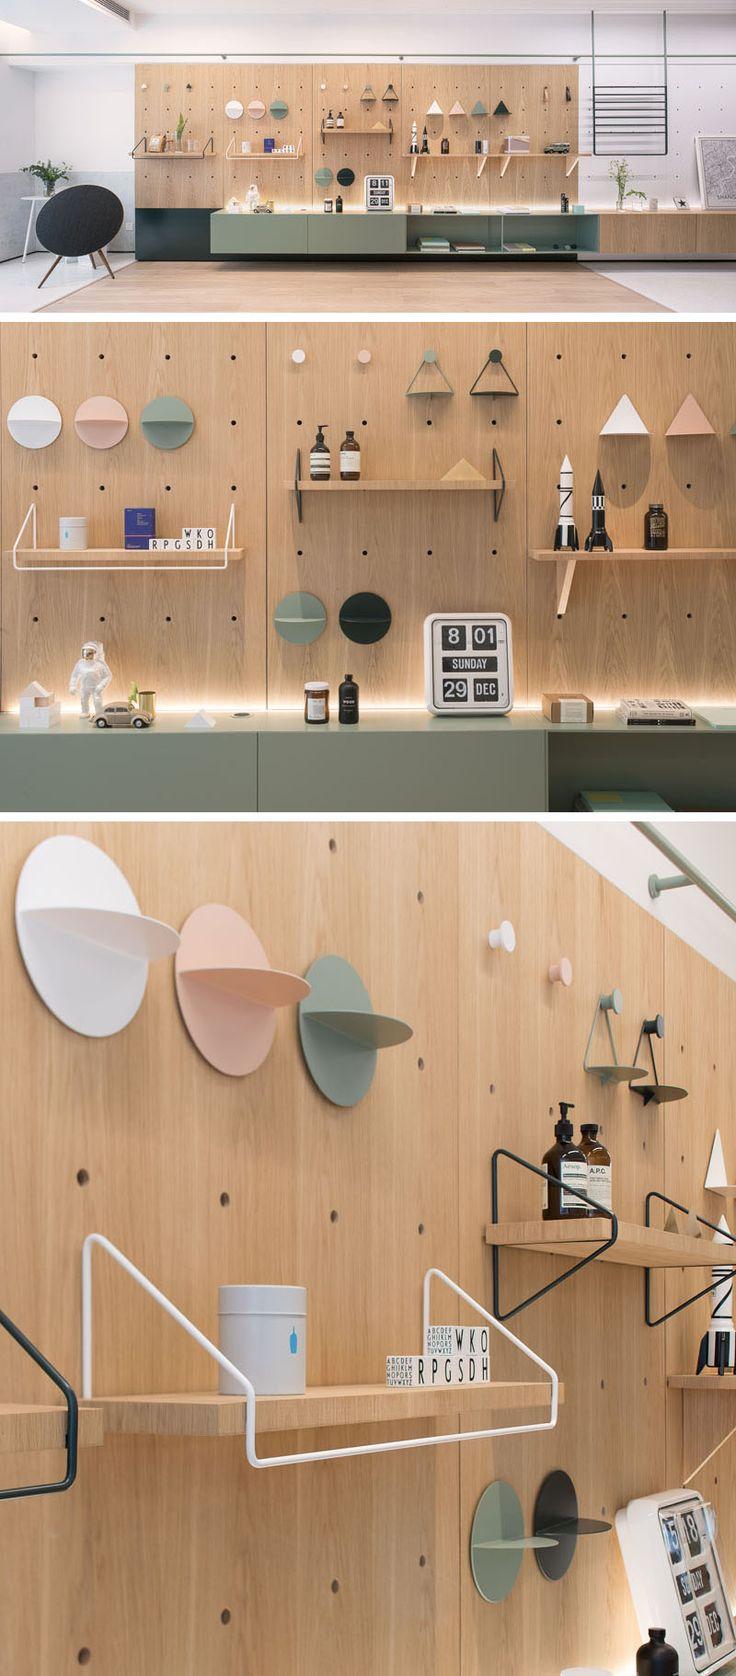 The 25+ best Modular furniture ideas on Pinterest | Modular table ...